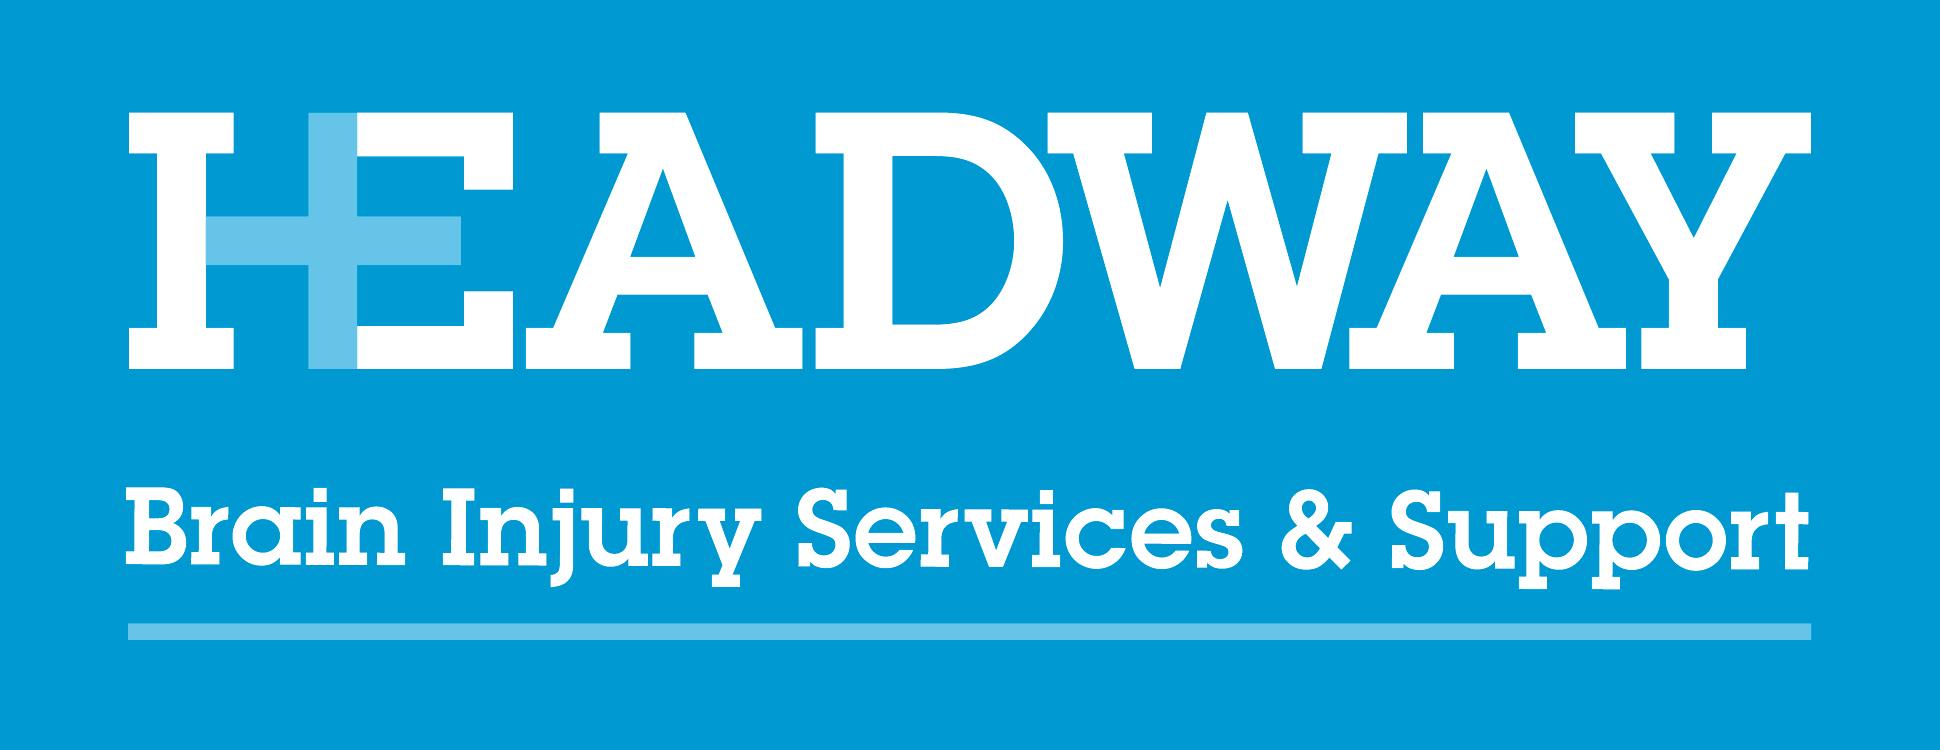 Headway Brain Injury Services & Support